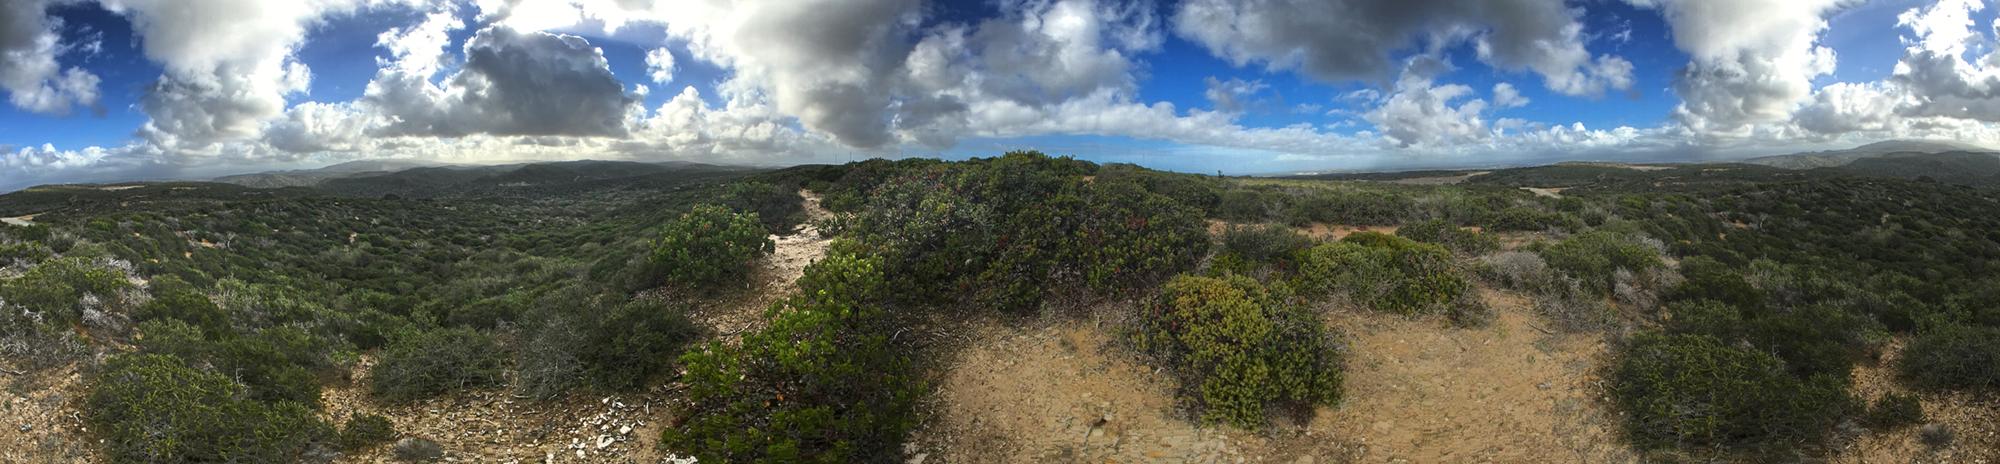 Panorama From Mt. Toro to Jacks Peak (Ft. Ord)